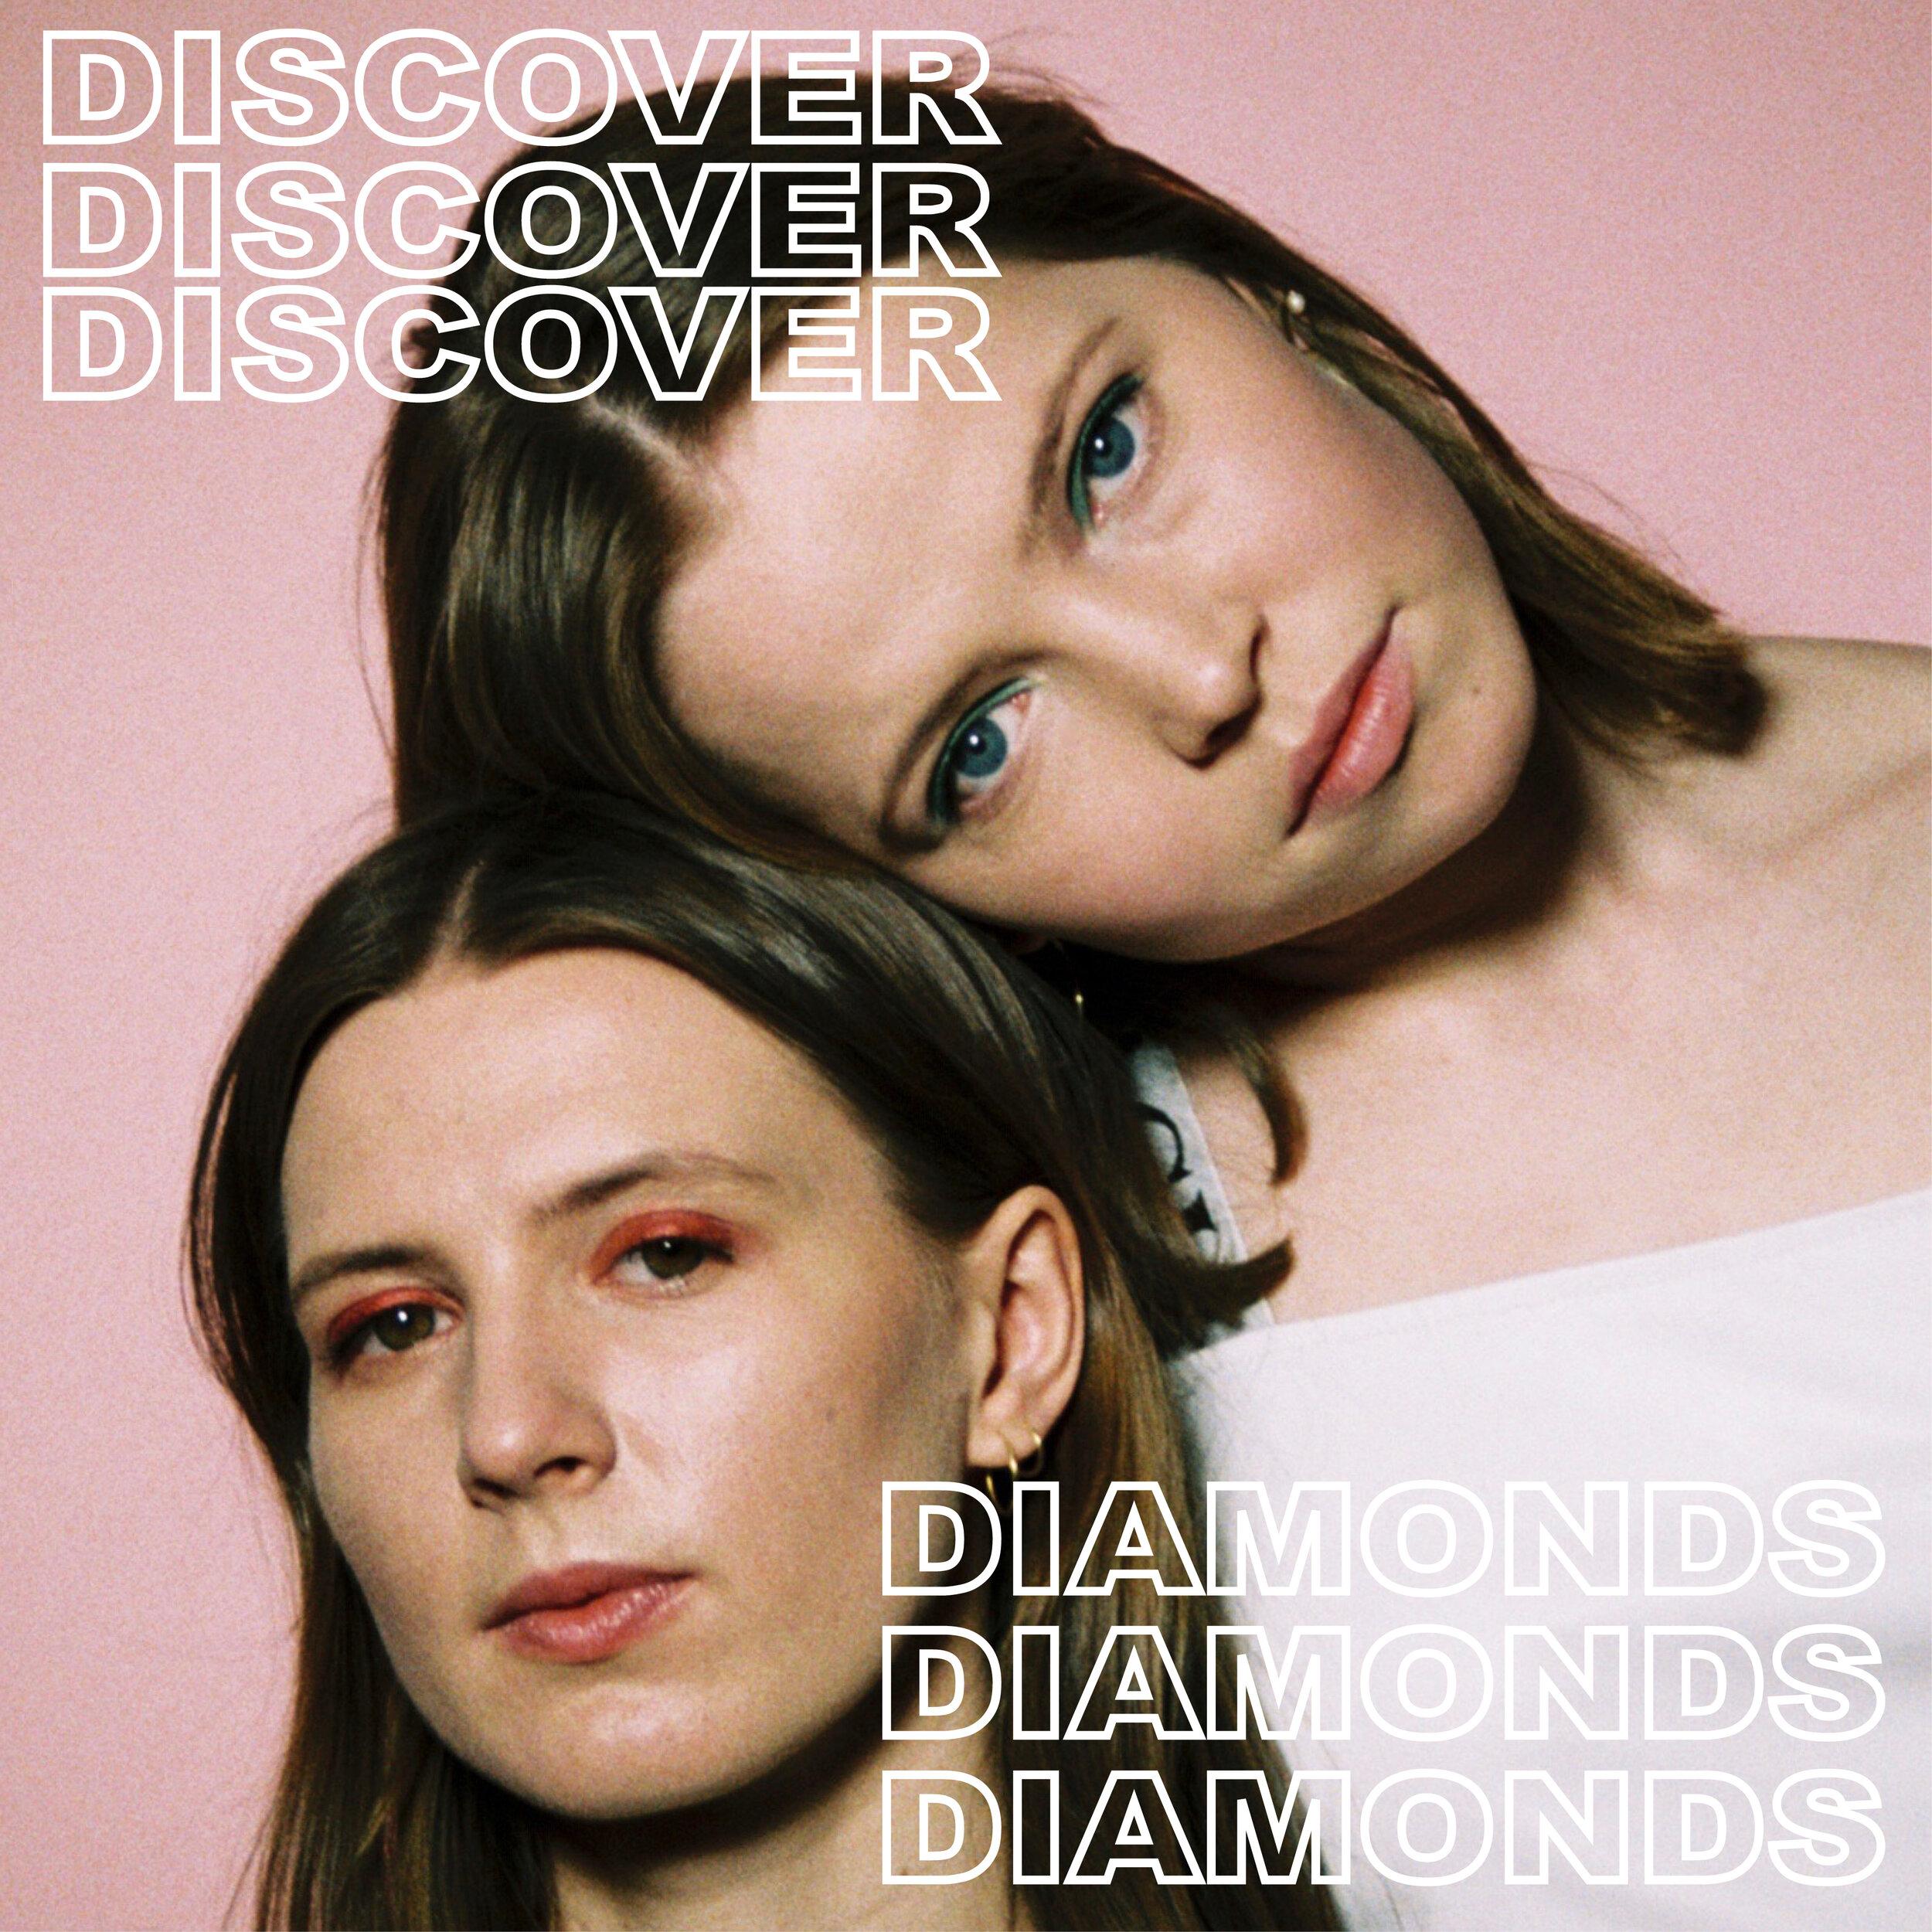 Discover diamond soft punch.jpg